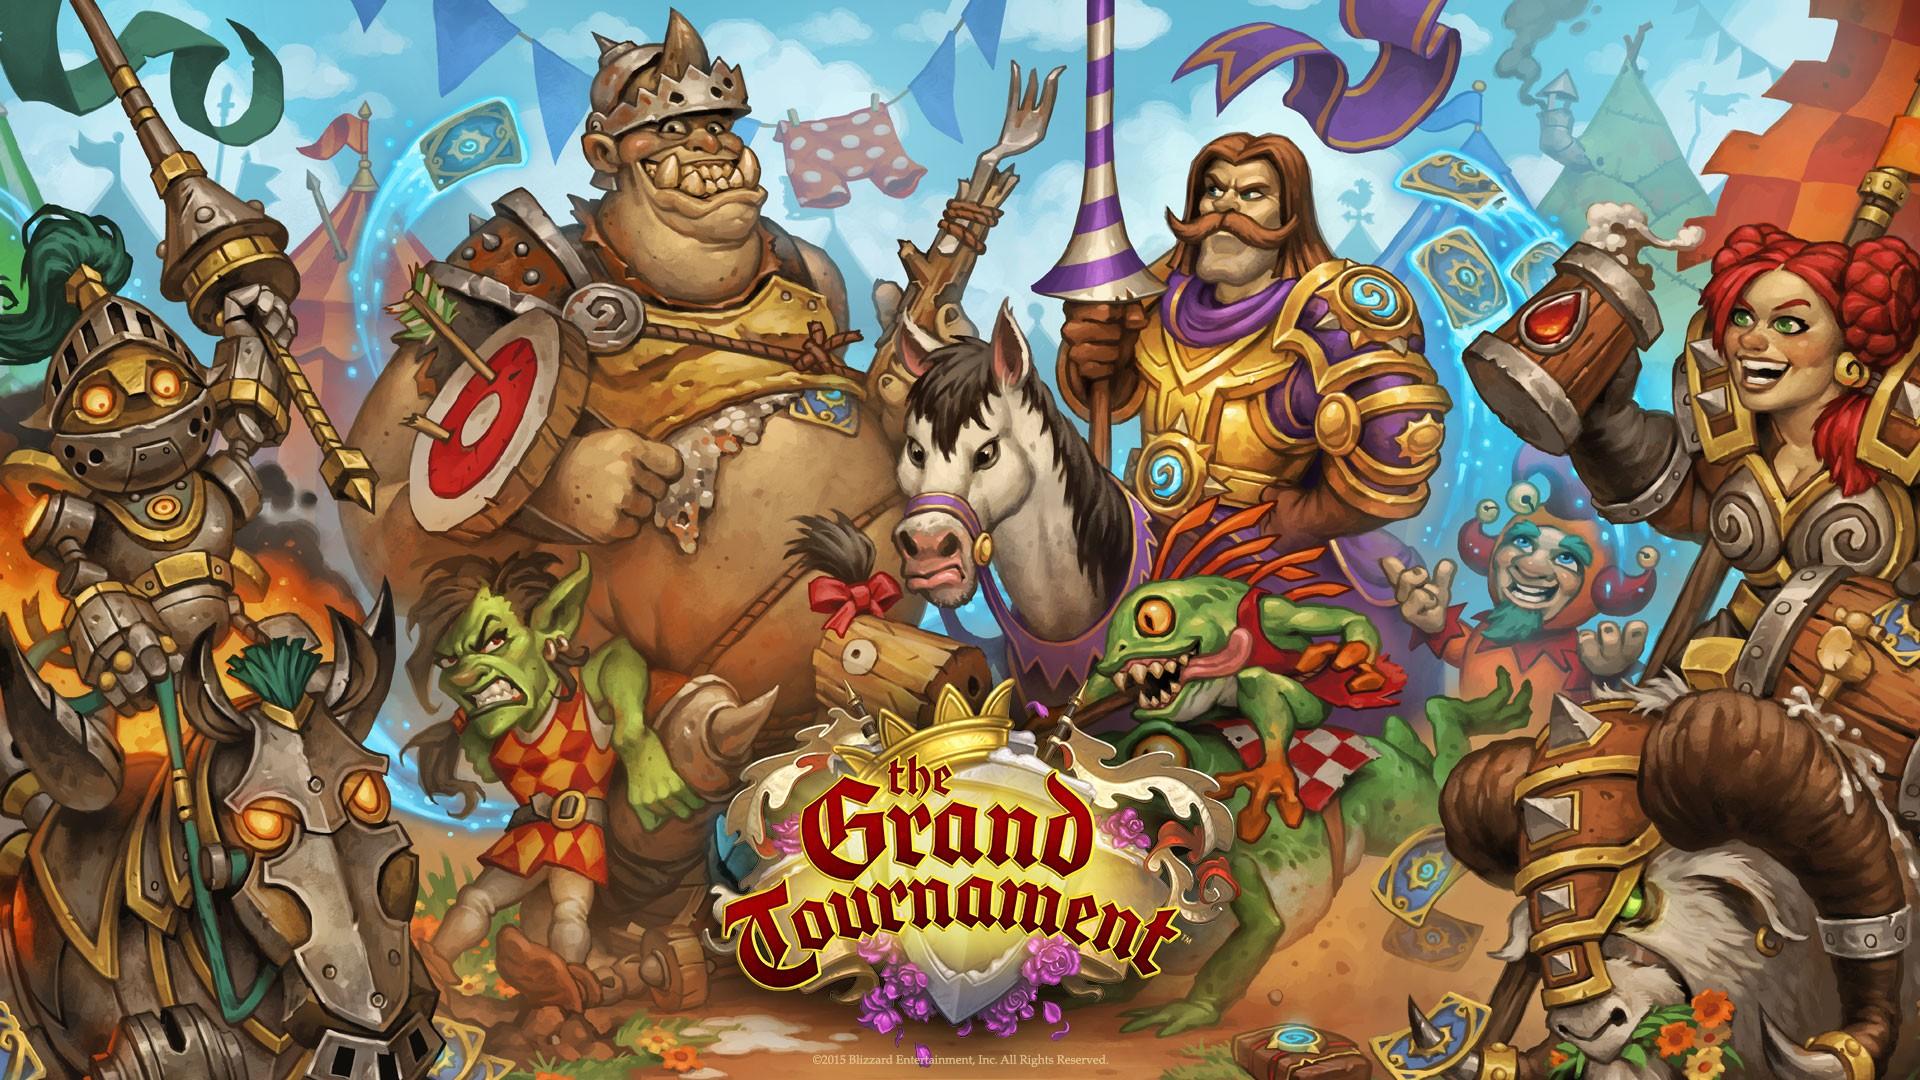 Blizzard Entertainment Comics Mythology Hearthstone The Grand Tournament Games Screenshot